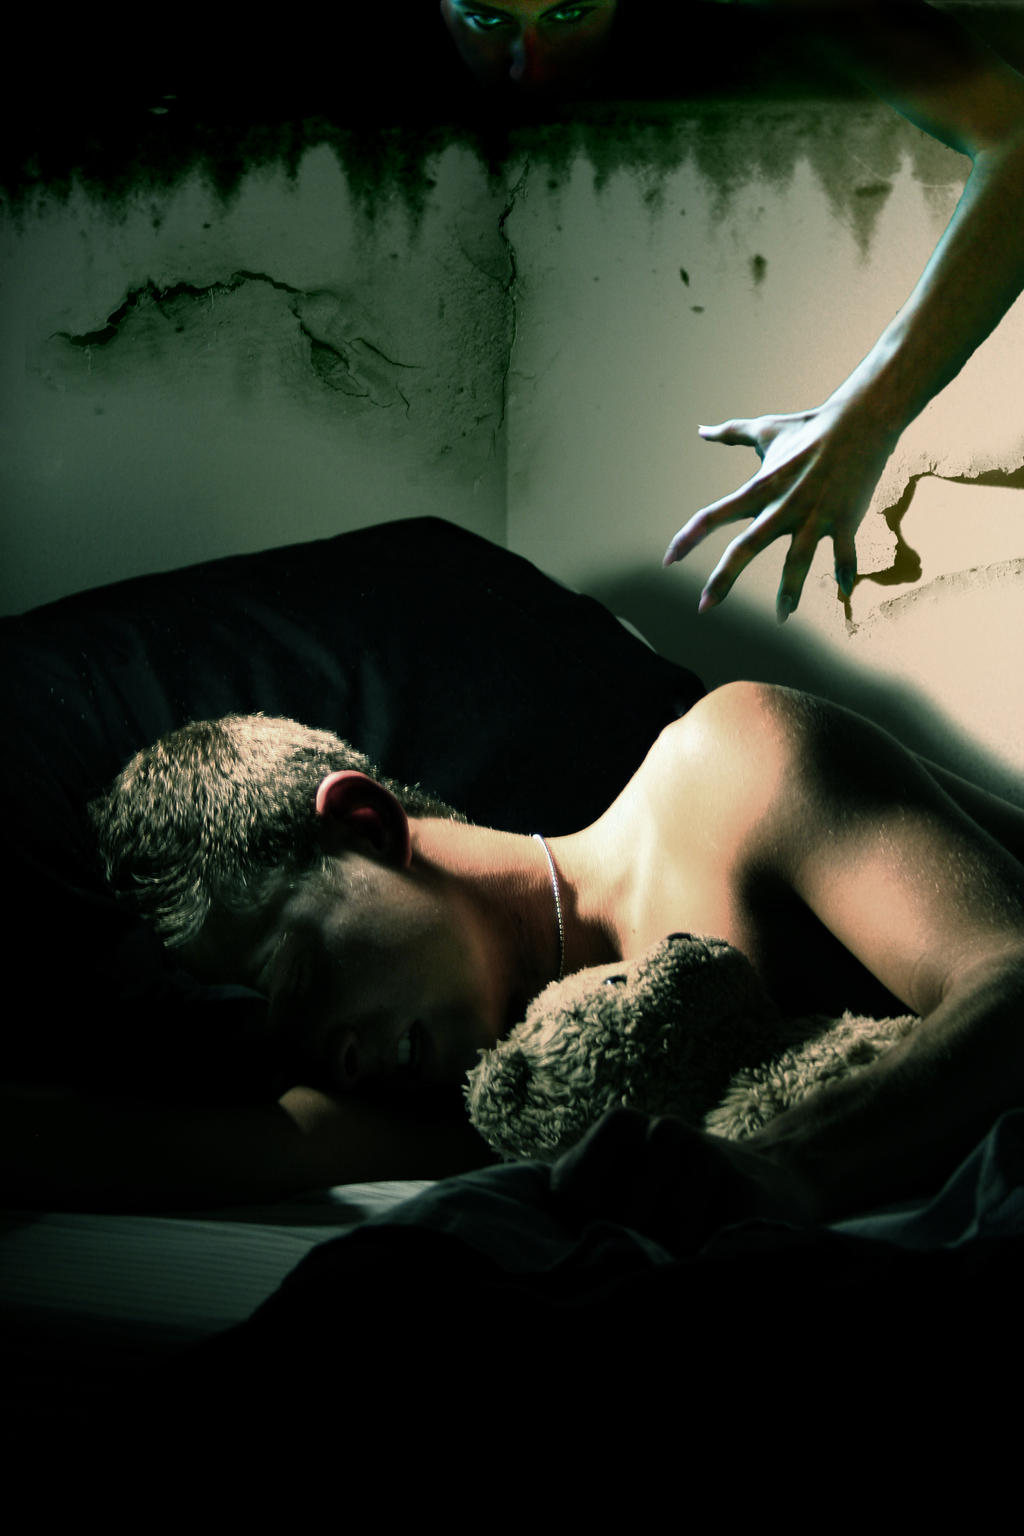 Silent Nightmare by vvmasterdrfan